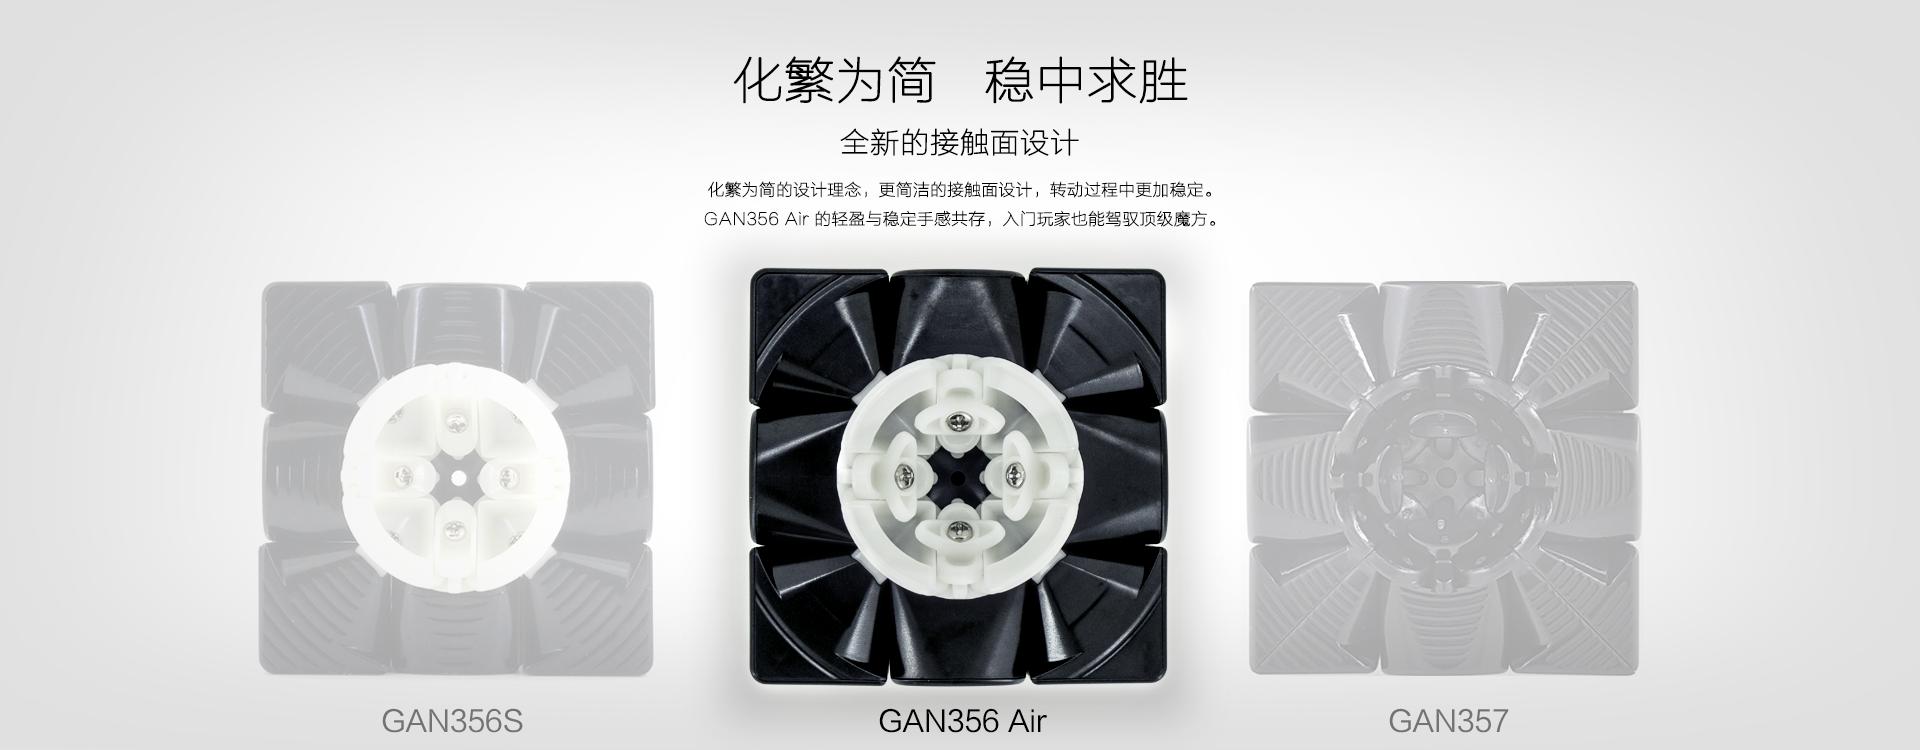 GAN356-Air-图文详情二_01